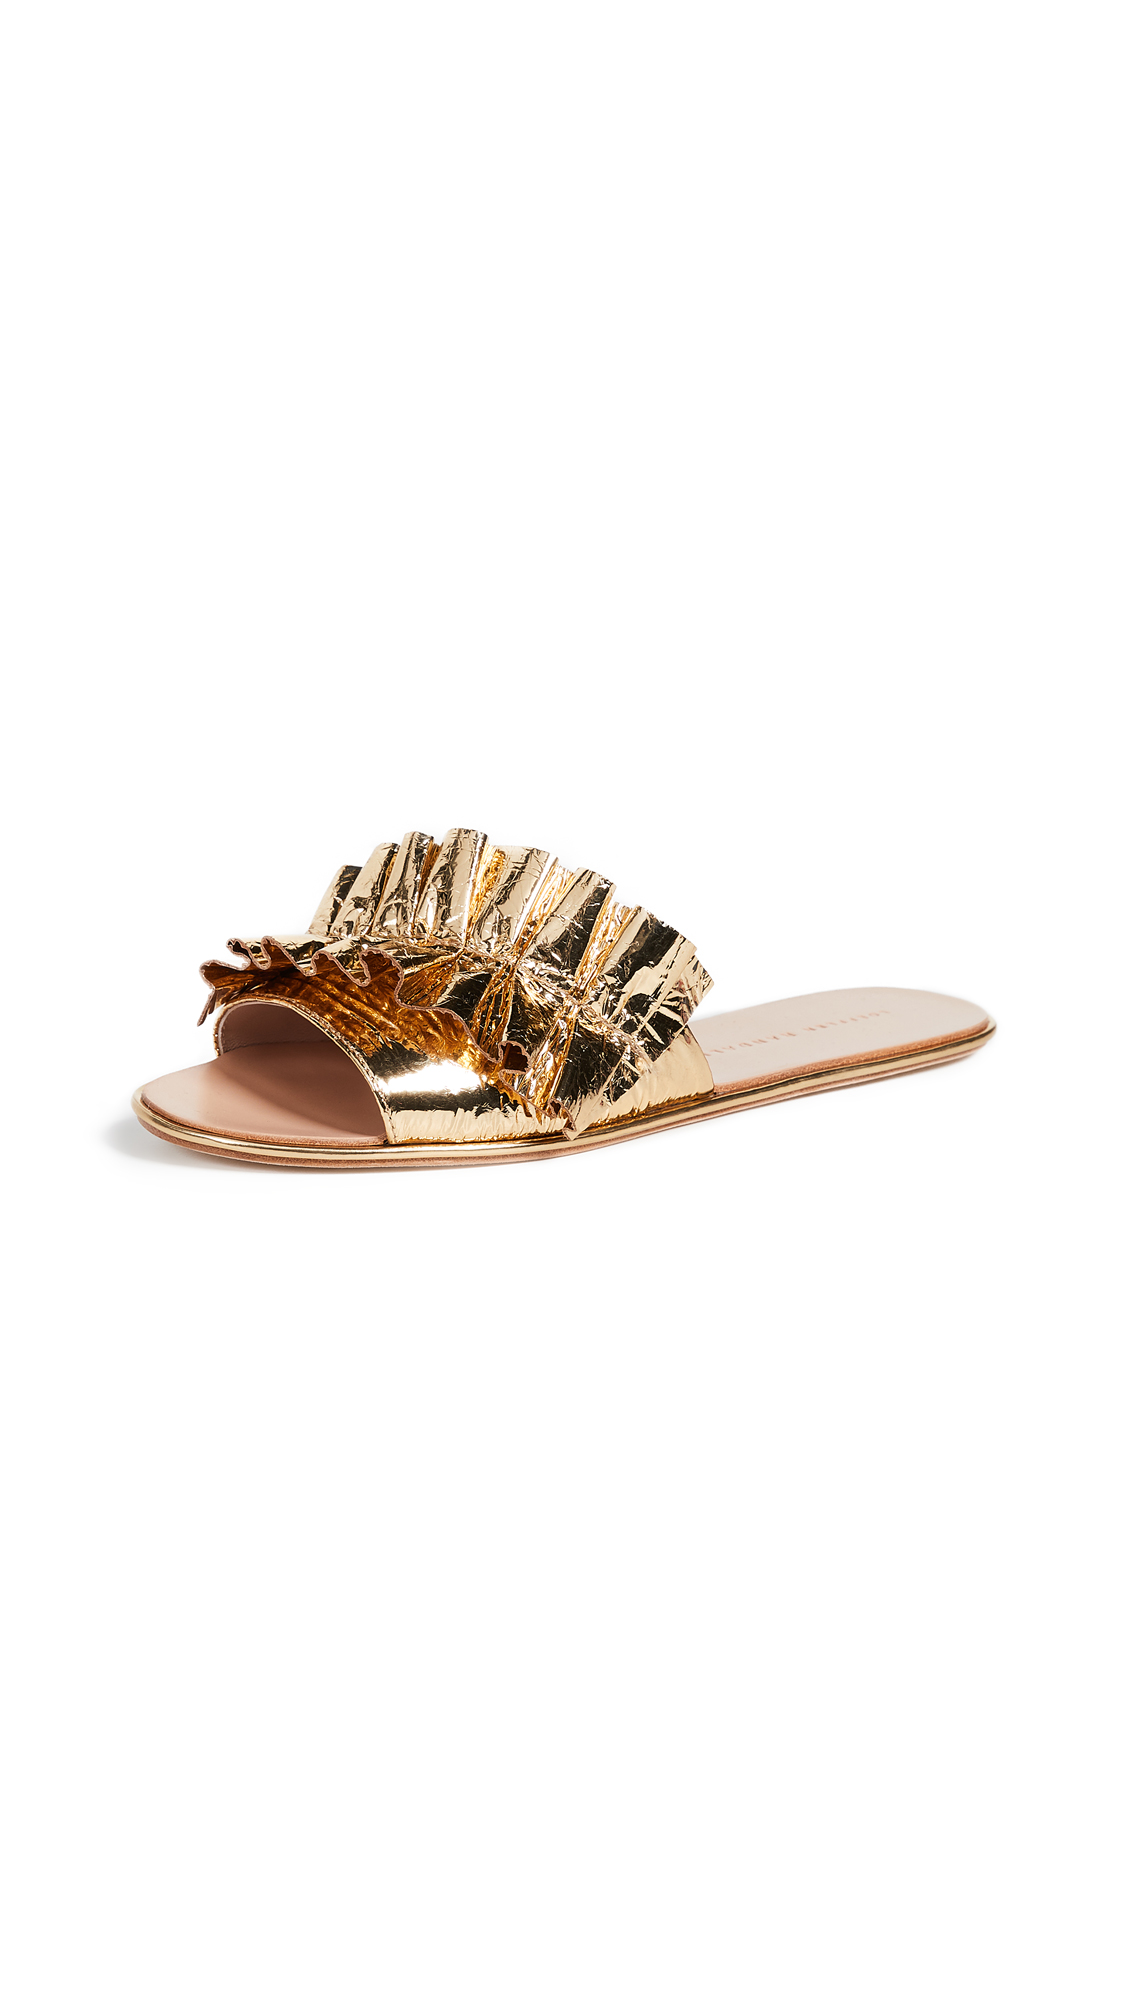 Loeffler Randall Rey Ruffle Slides - Gold